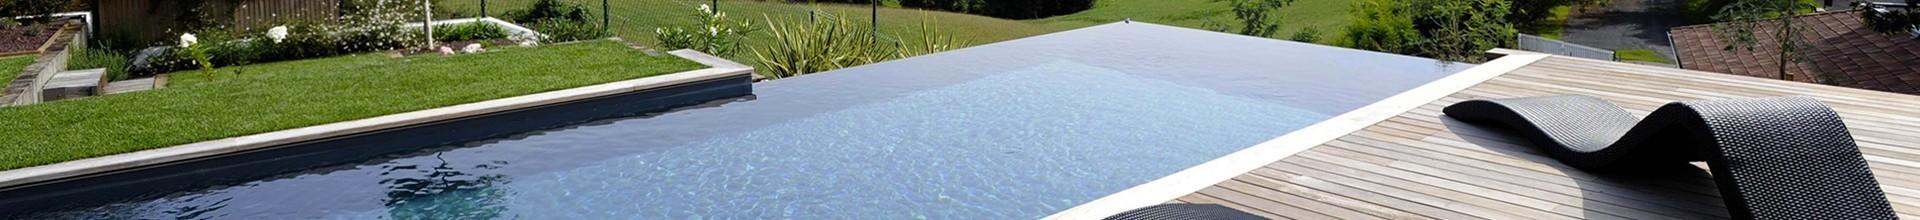 Direct usine, piscine coque prix Rhône